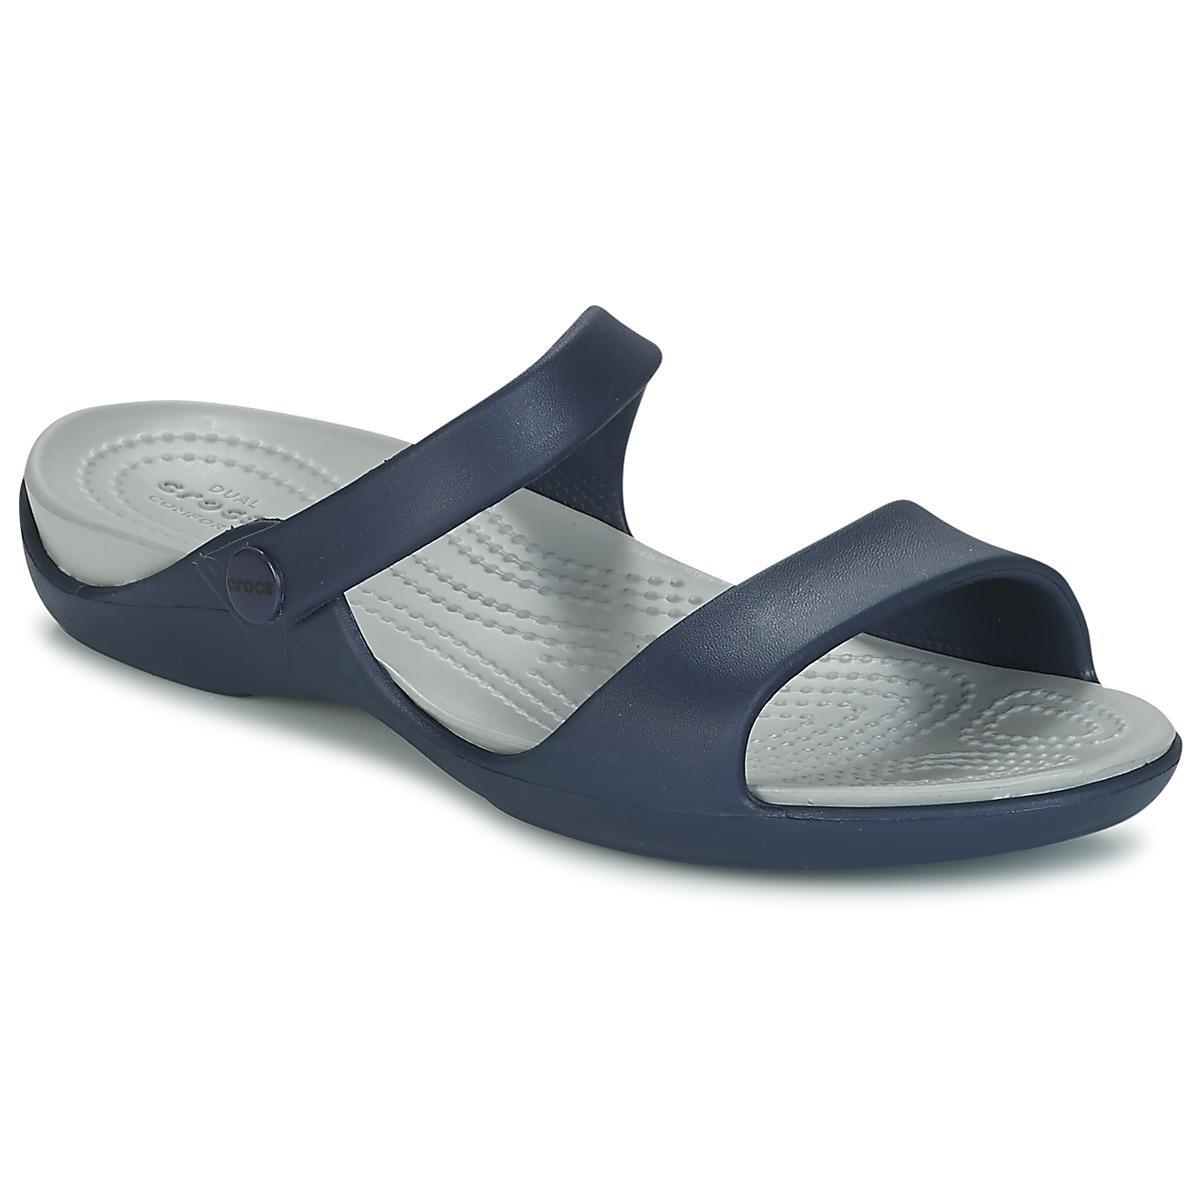 f88499f13afcdd Crocs™ Cleo V Sandals in Blue - Lyst